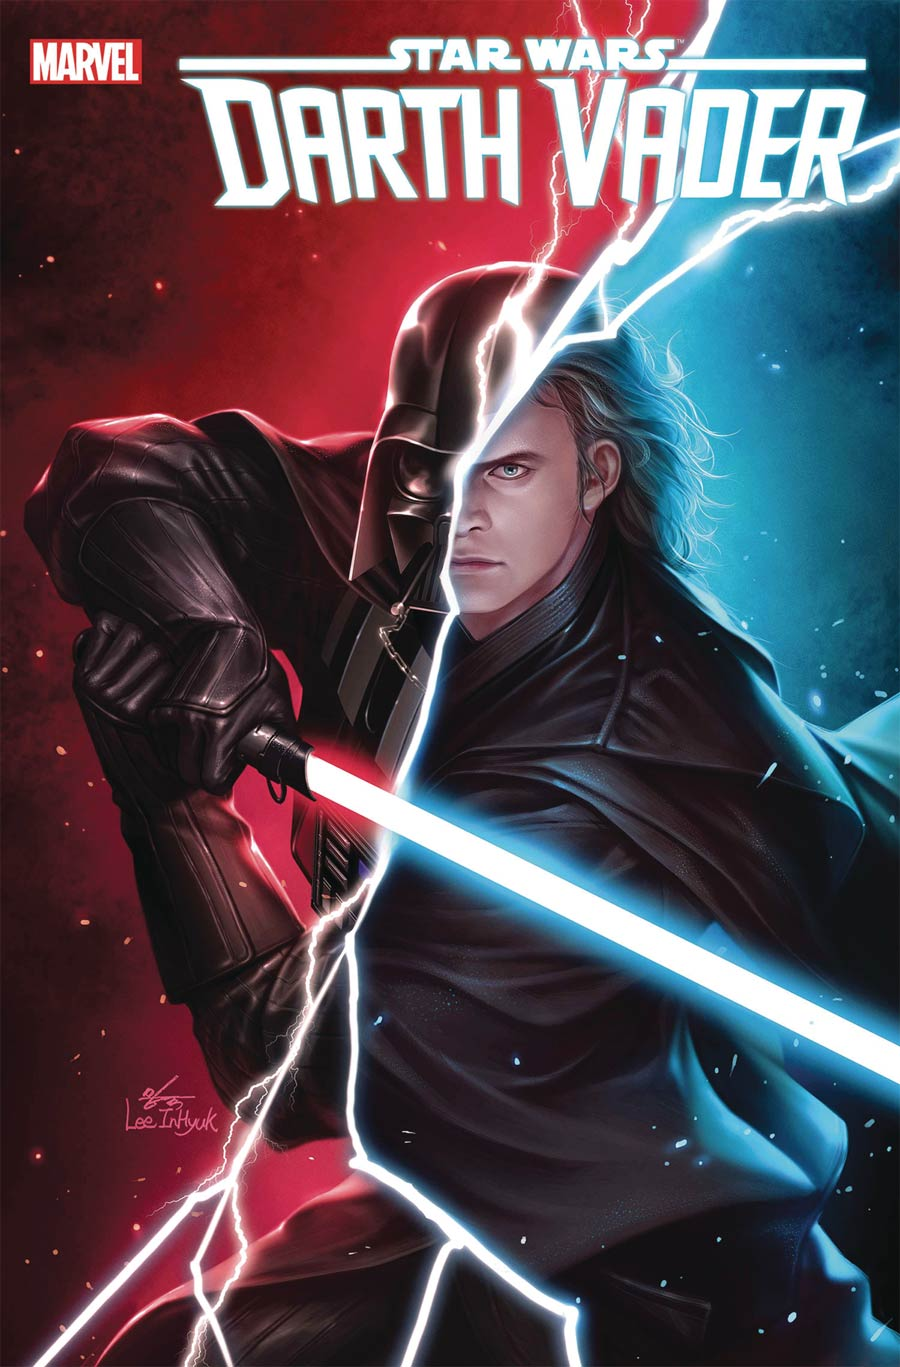 Star Wars Darth Vader #5 Cover A Regular Inhyuk Lee Cover